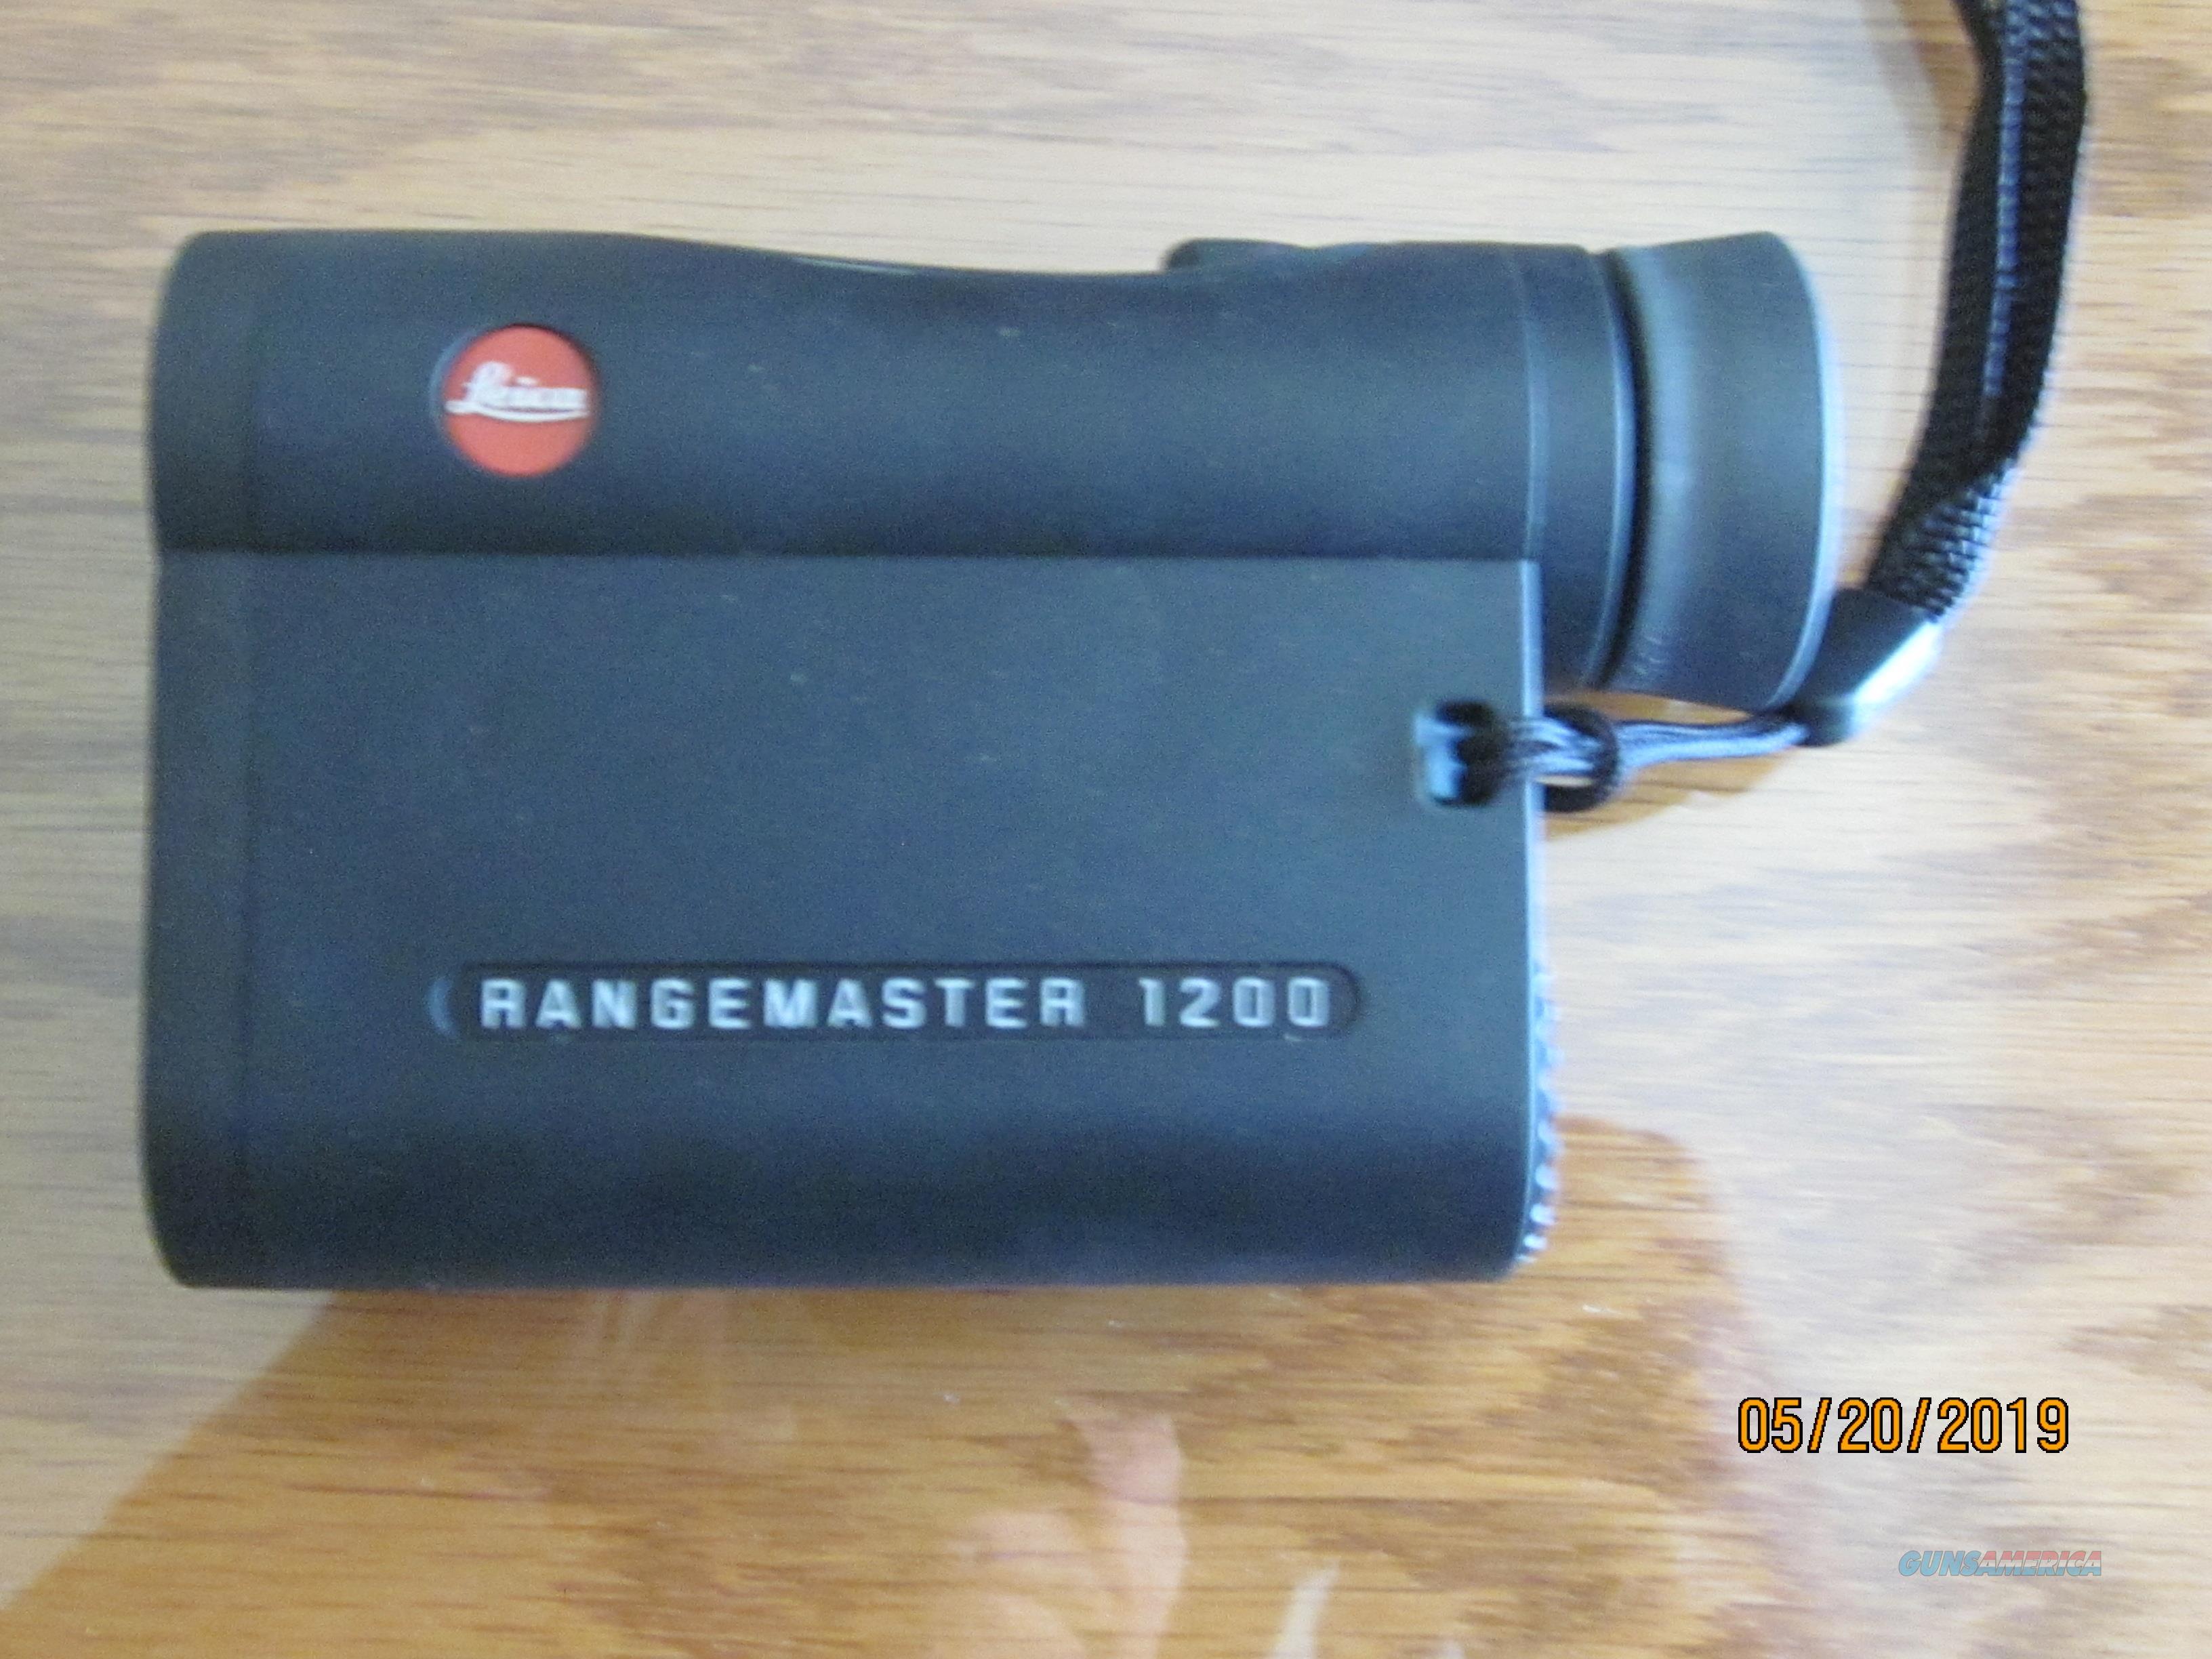 LEICA RANGEMASTER 1200 CRF Y Rangefinder   Non-Guns > Scopes/Mounts/Rings & Optics > Non-Scope Optics > Rangefinders